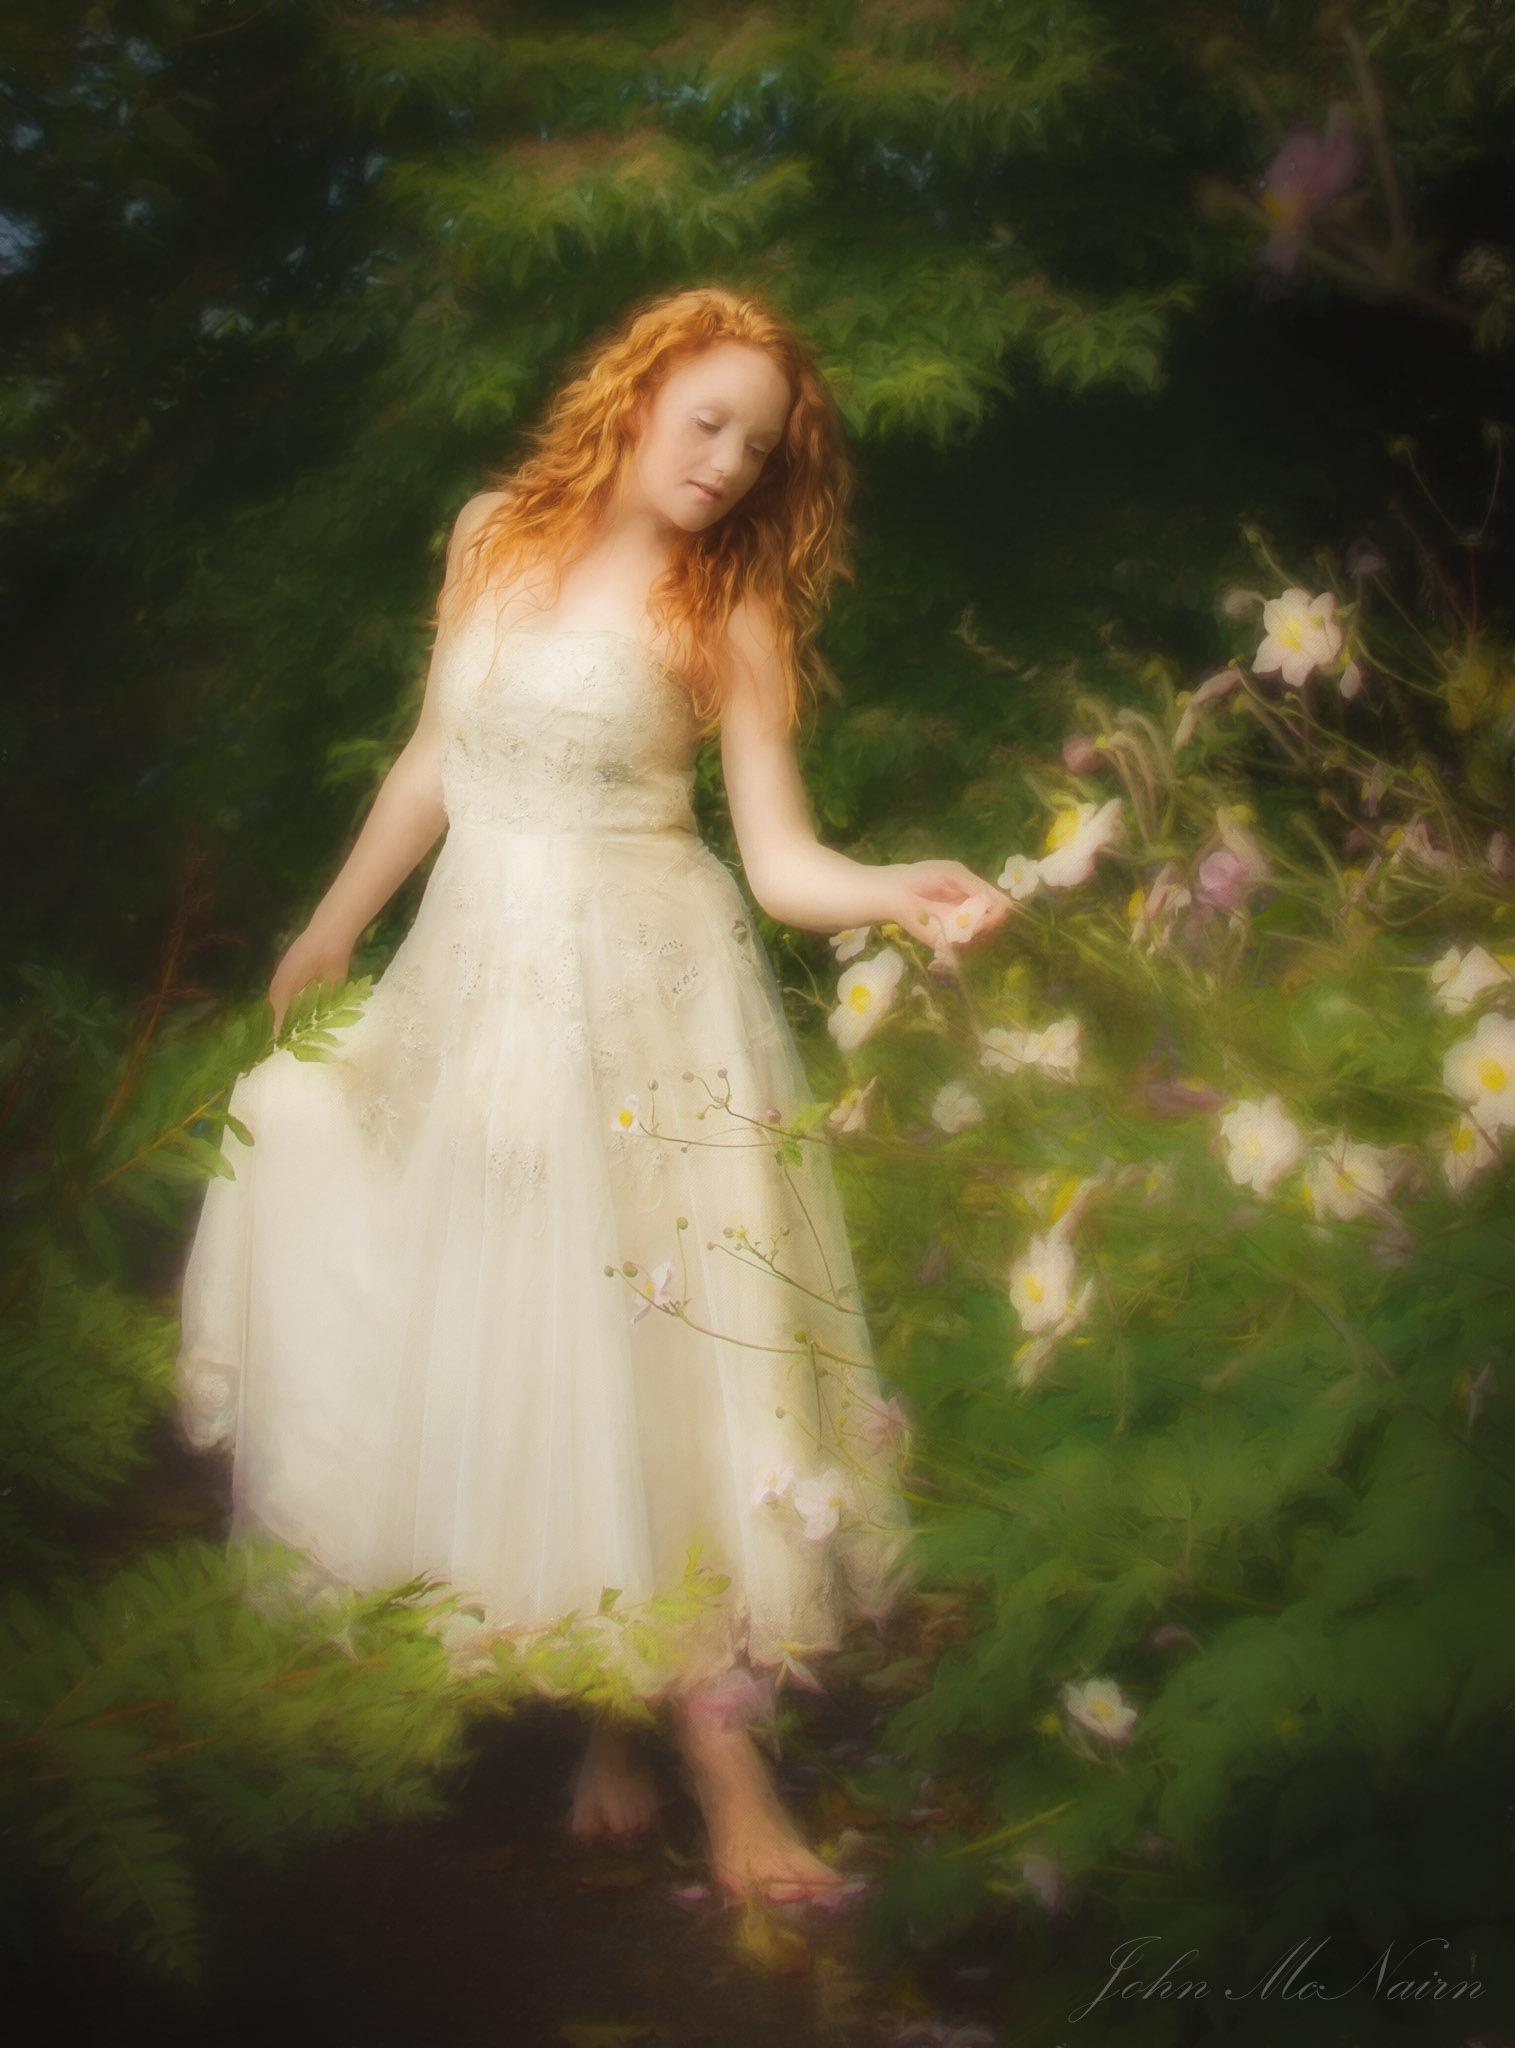 The Flower Tender by John McNairn